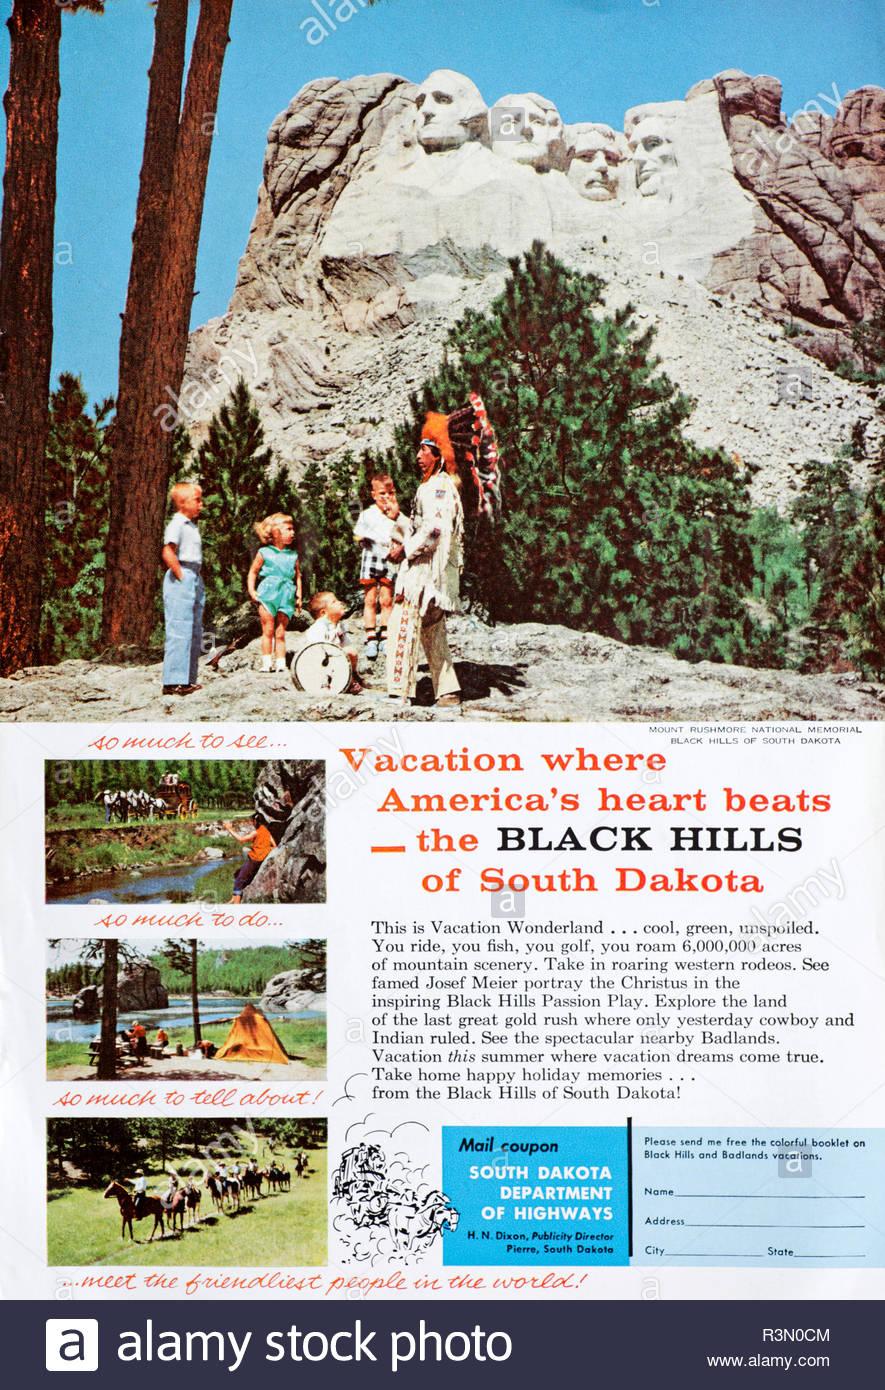 Vintage advertising for South Dakota, USA from 1958 - Stock Image